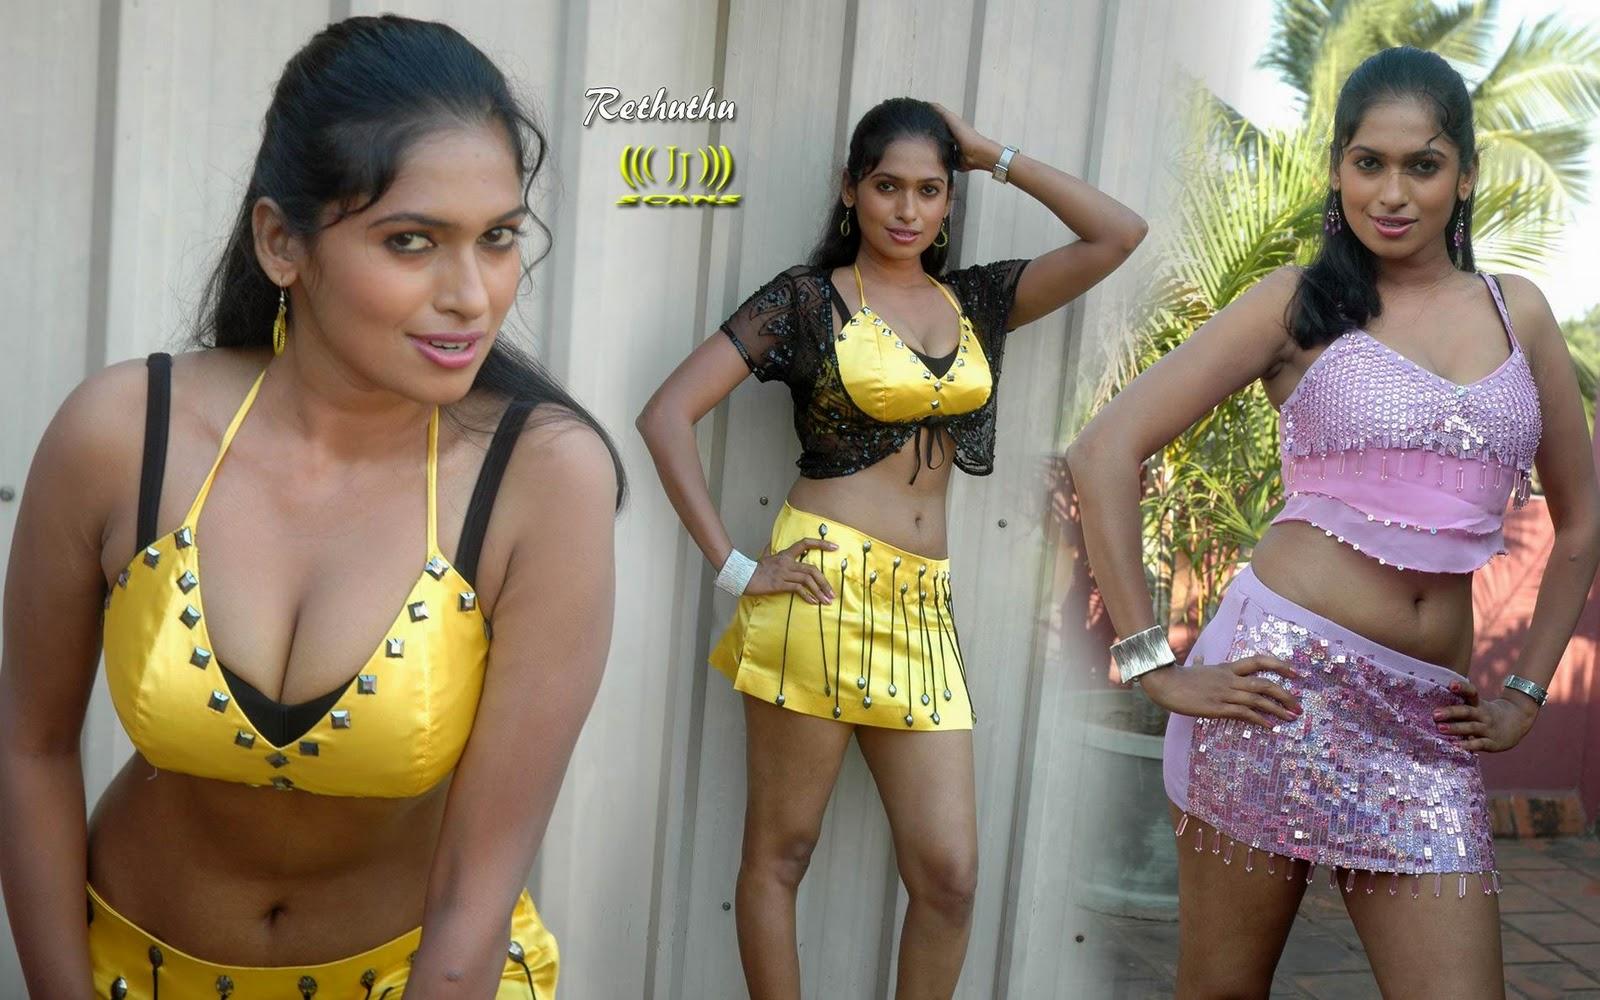 http://2.bp.blogspot.com/-gVhKW1Xu2_Y/Txhg3mbz1WI/AAAAAAAALZA/UcwqBo-5SKM/s1600/10+Paavi-Tamil-Movie-Stills.jpg